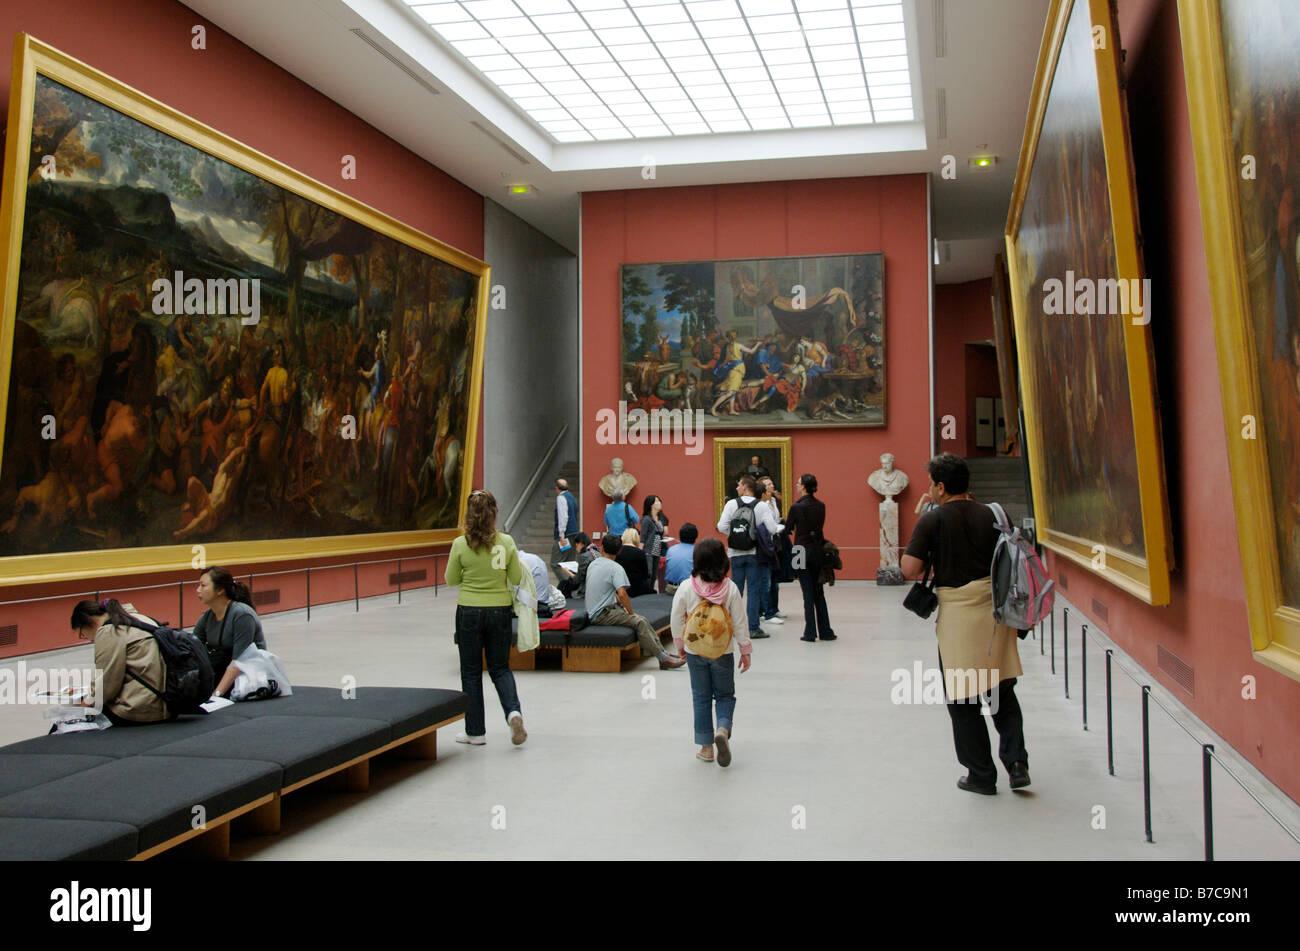 Louvre gallery. Paris, inside the art gallery - Stock Image